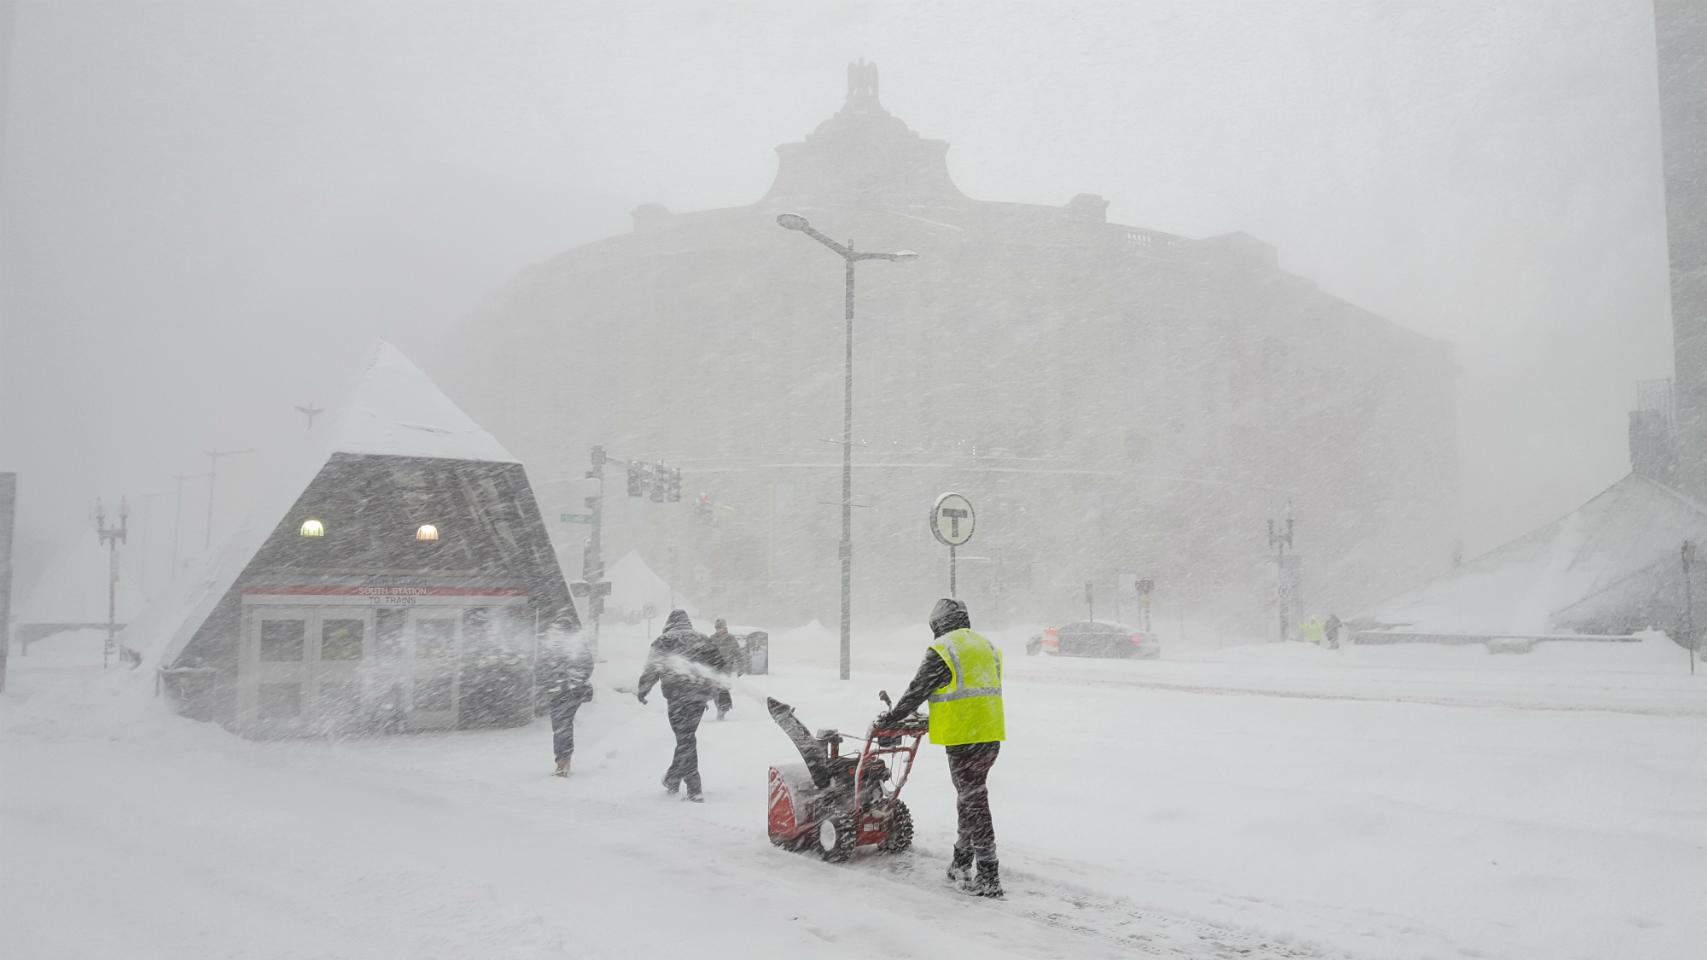 south-station-snow-blower.jpg